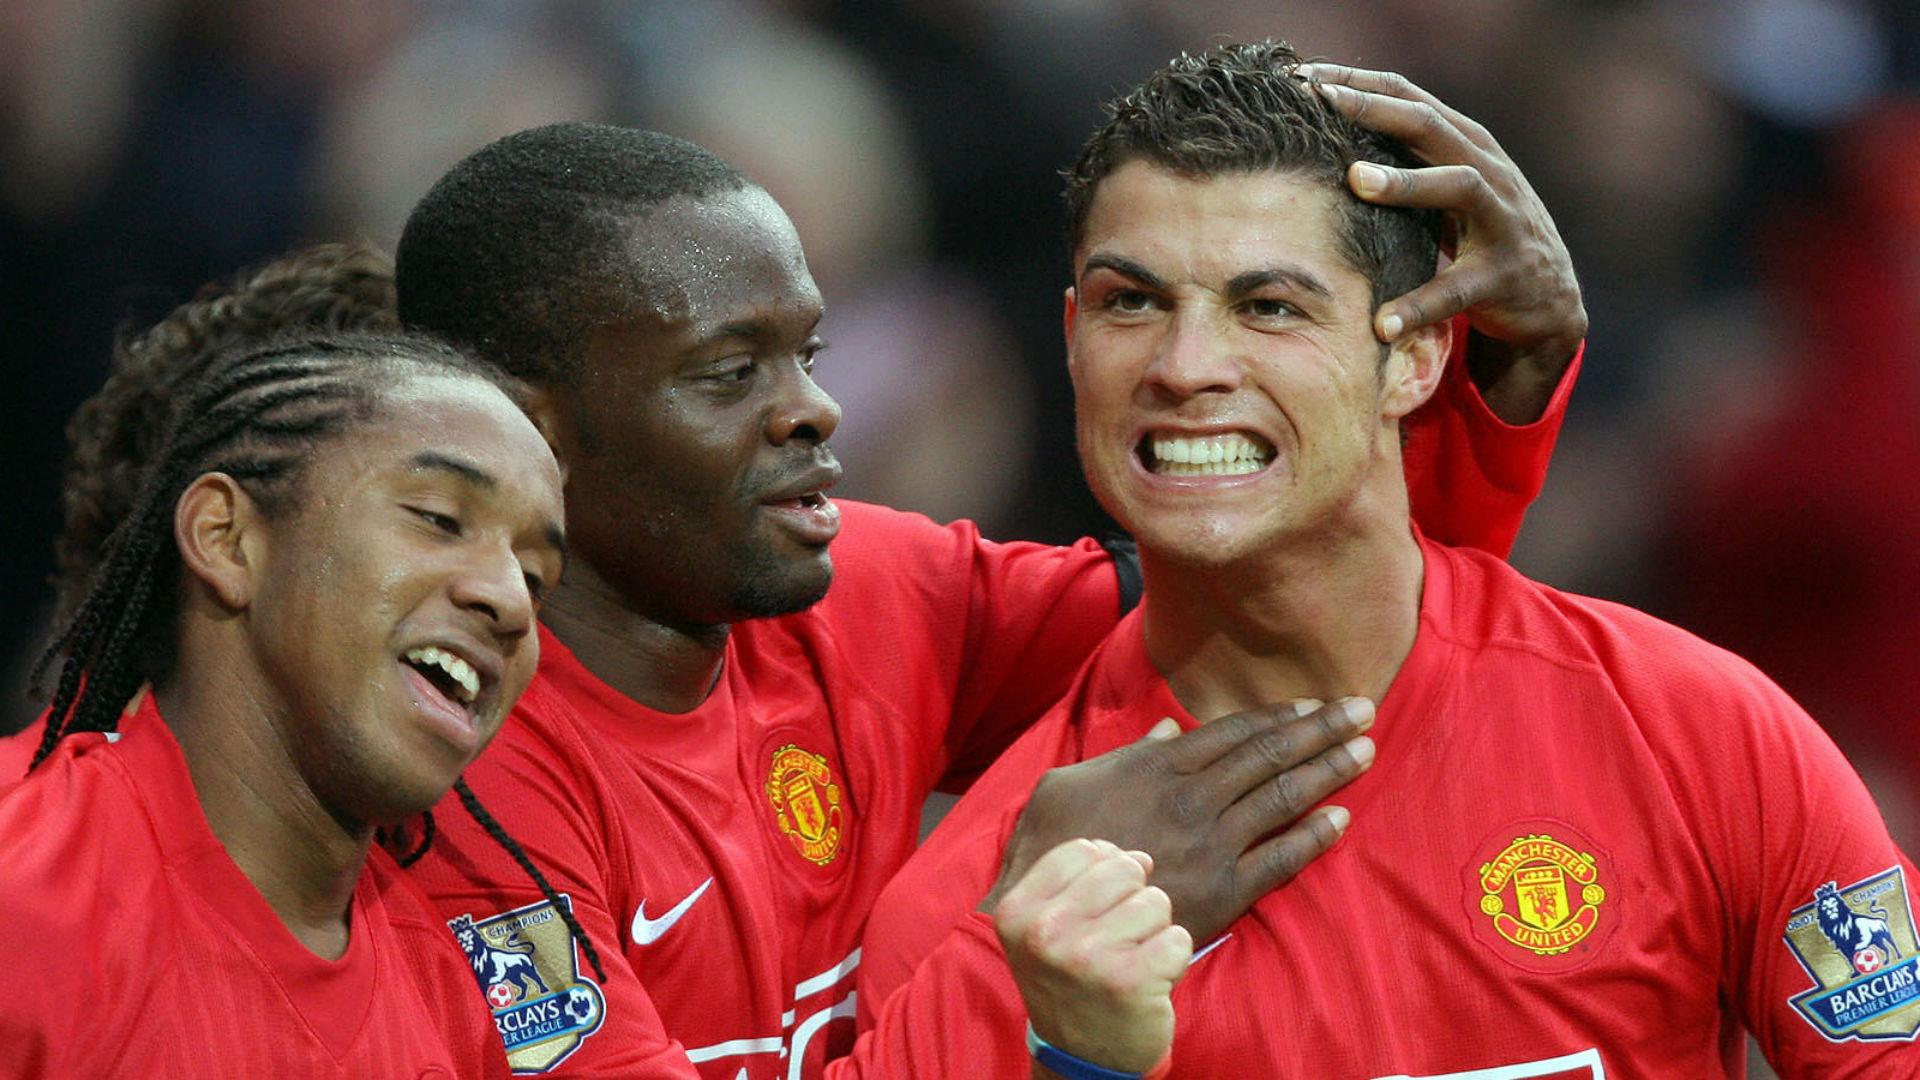 Cristiano Ronaldo has it all' - former Man Utd striker Louis Saha ...